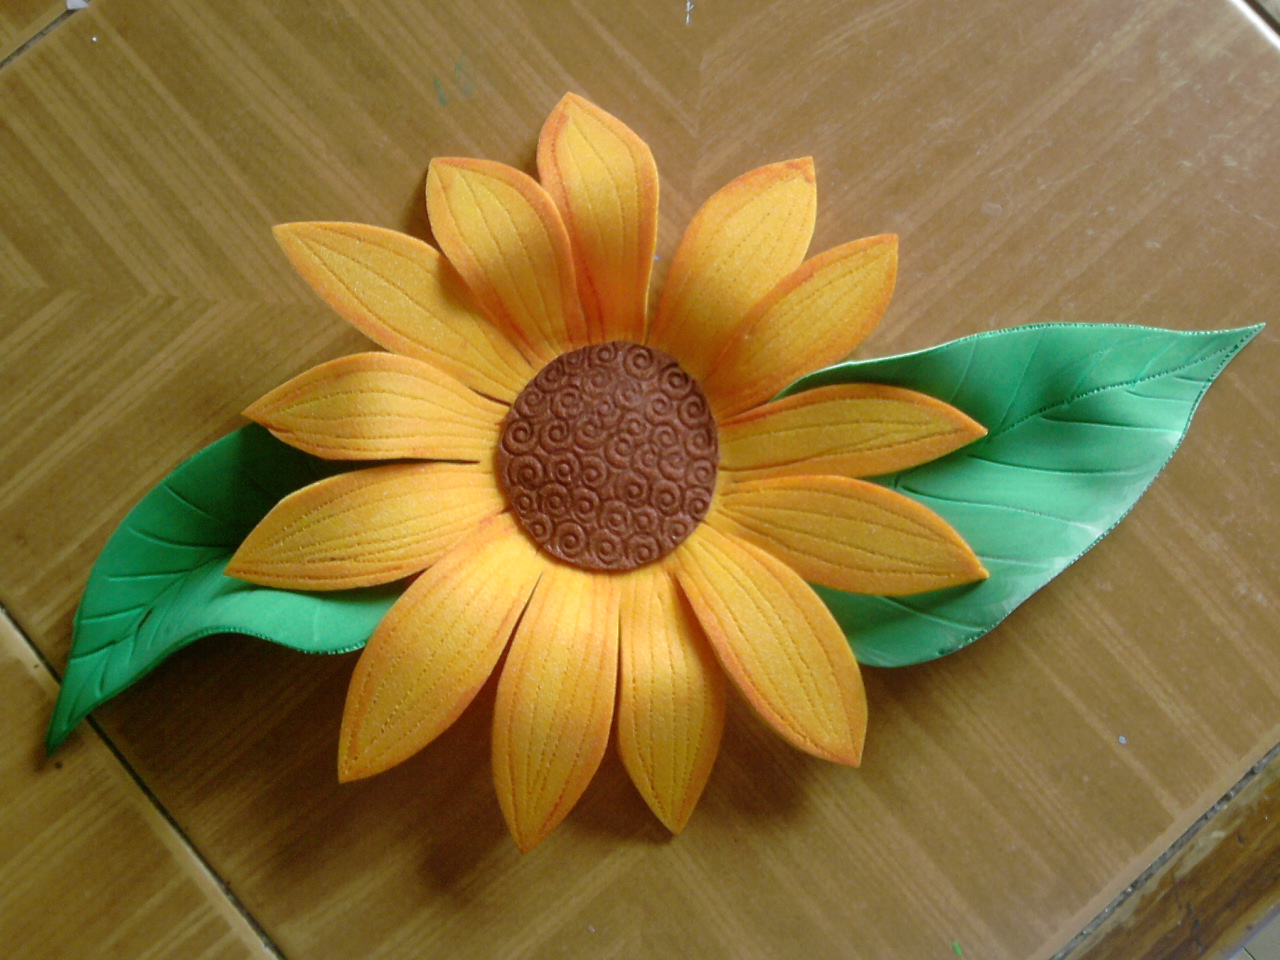 Moldes para hacer girasoles en foami Imagui